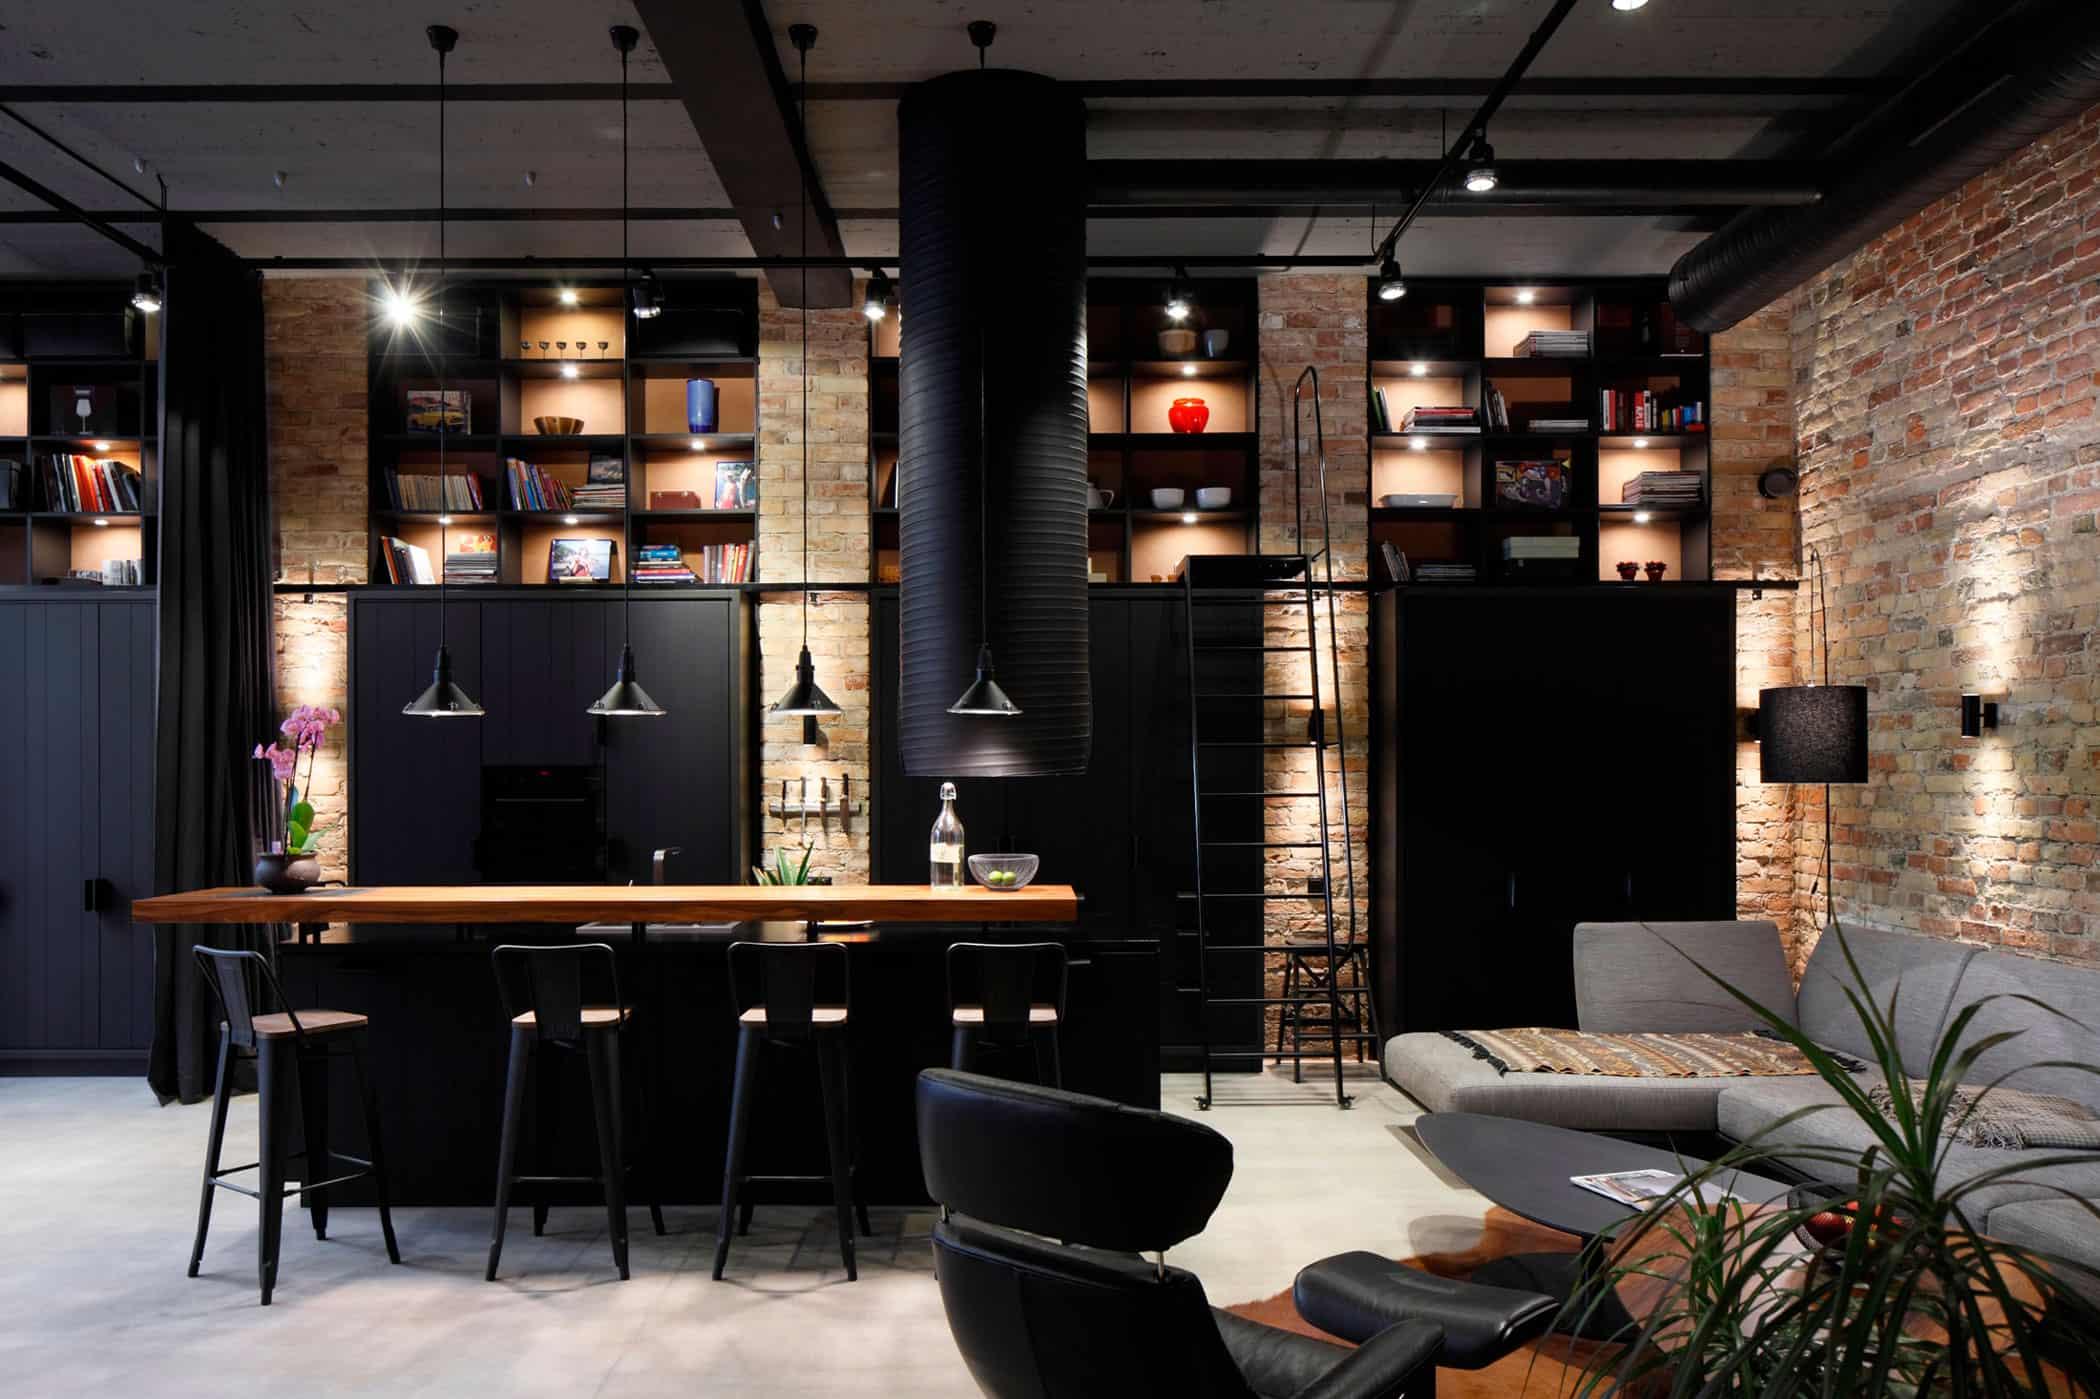 OPEN AD U2013 Architecture And Design Creates An Industrial Chic Apartment In  Riga, Latvia